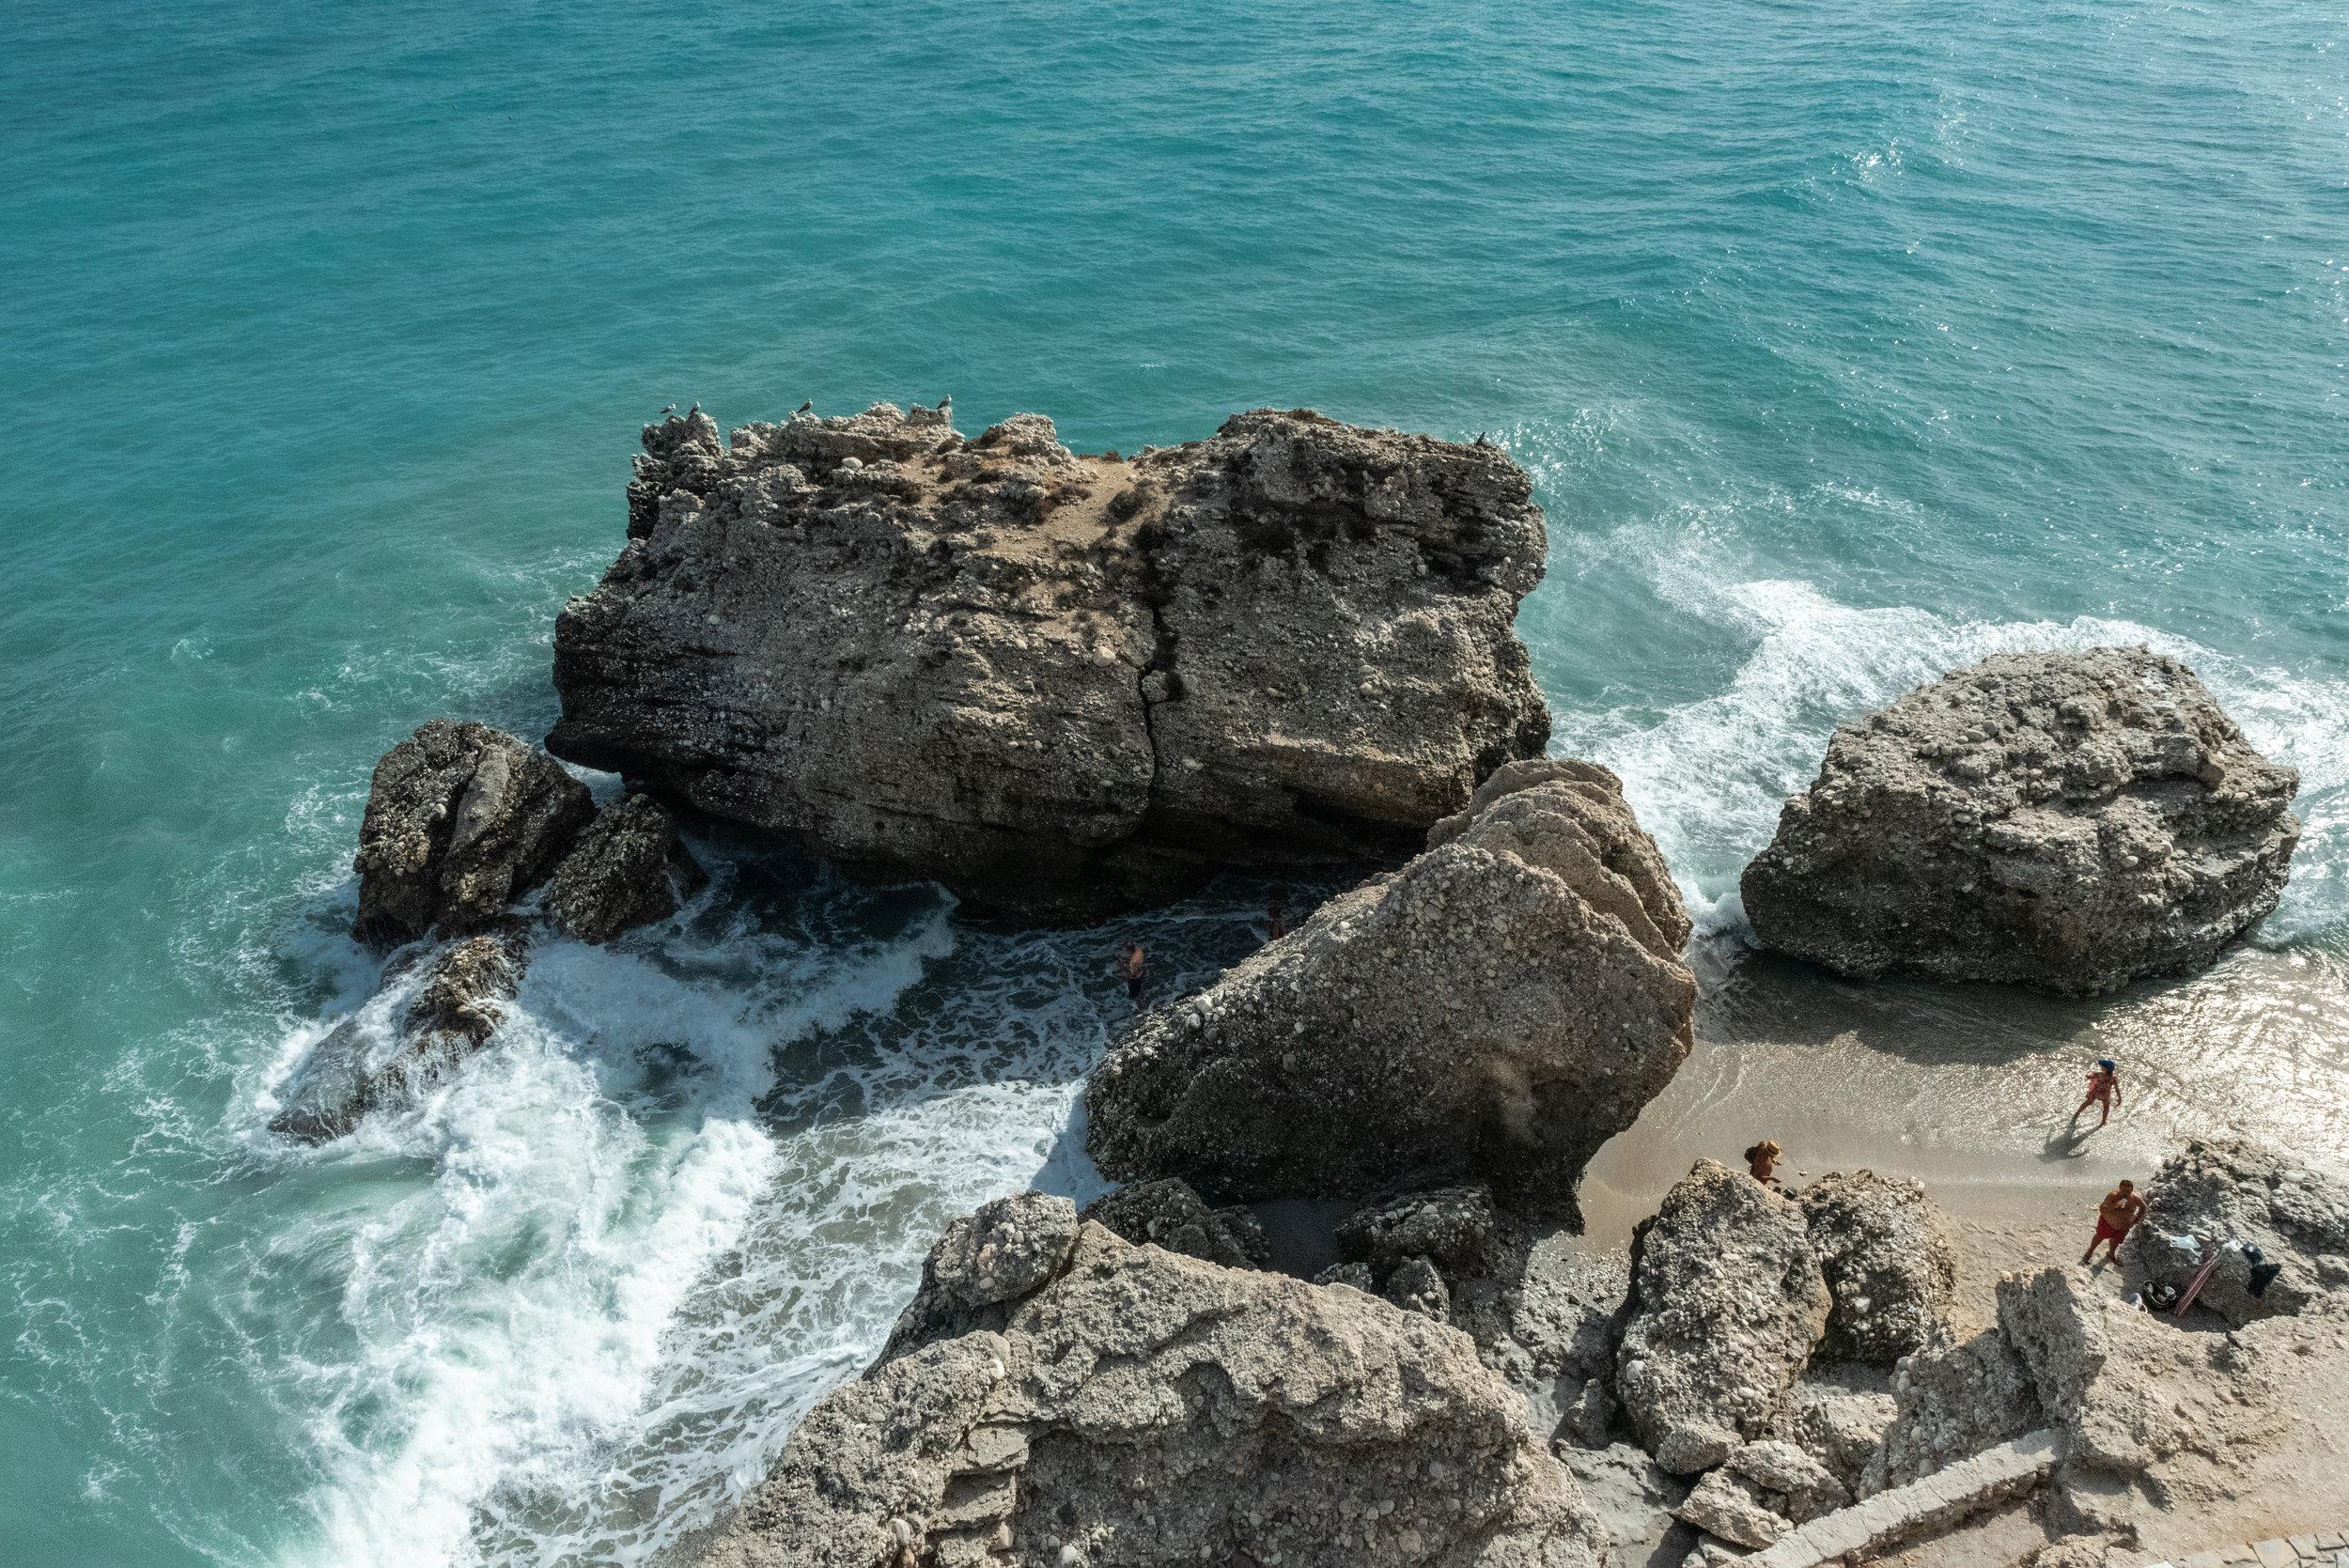 nerja sea water crashing on the rocks, Spain